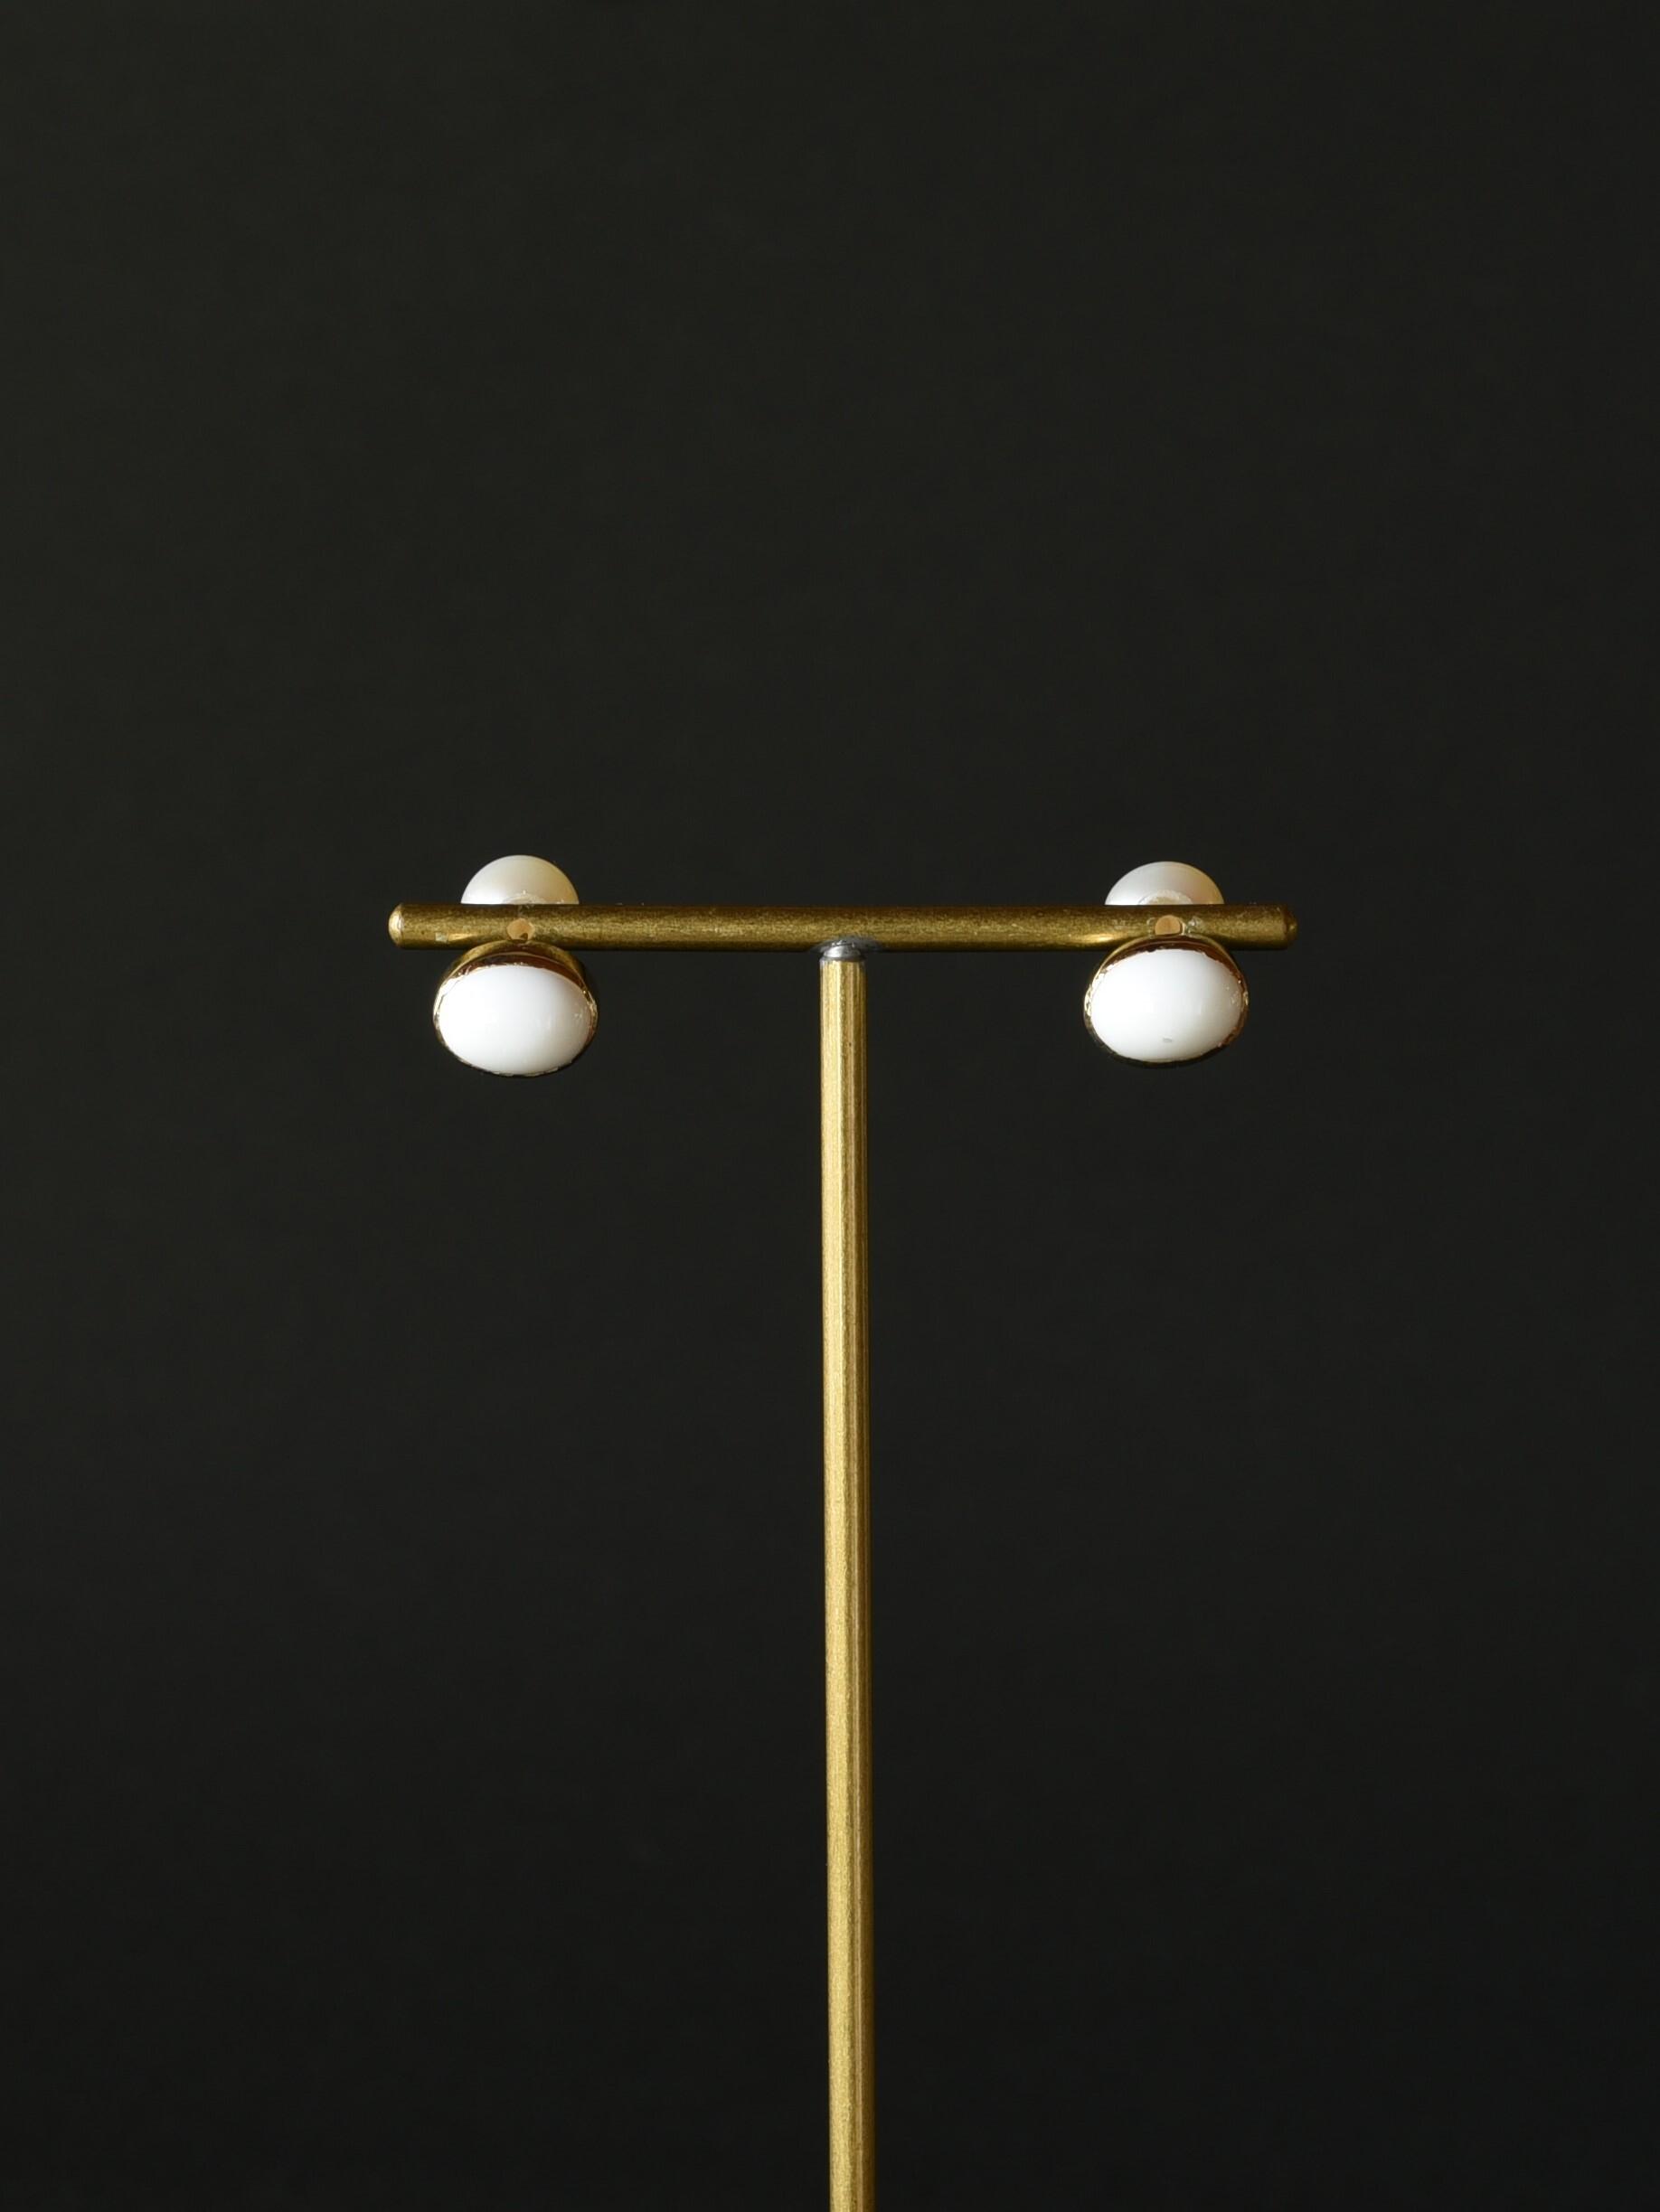 accessories mau p76 ホワイトオニキスオパール brass